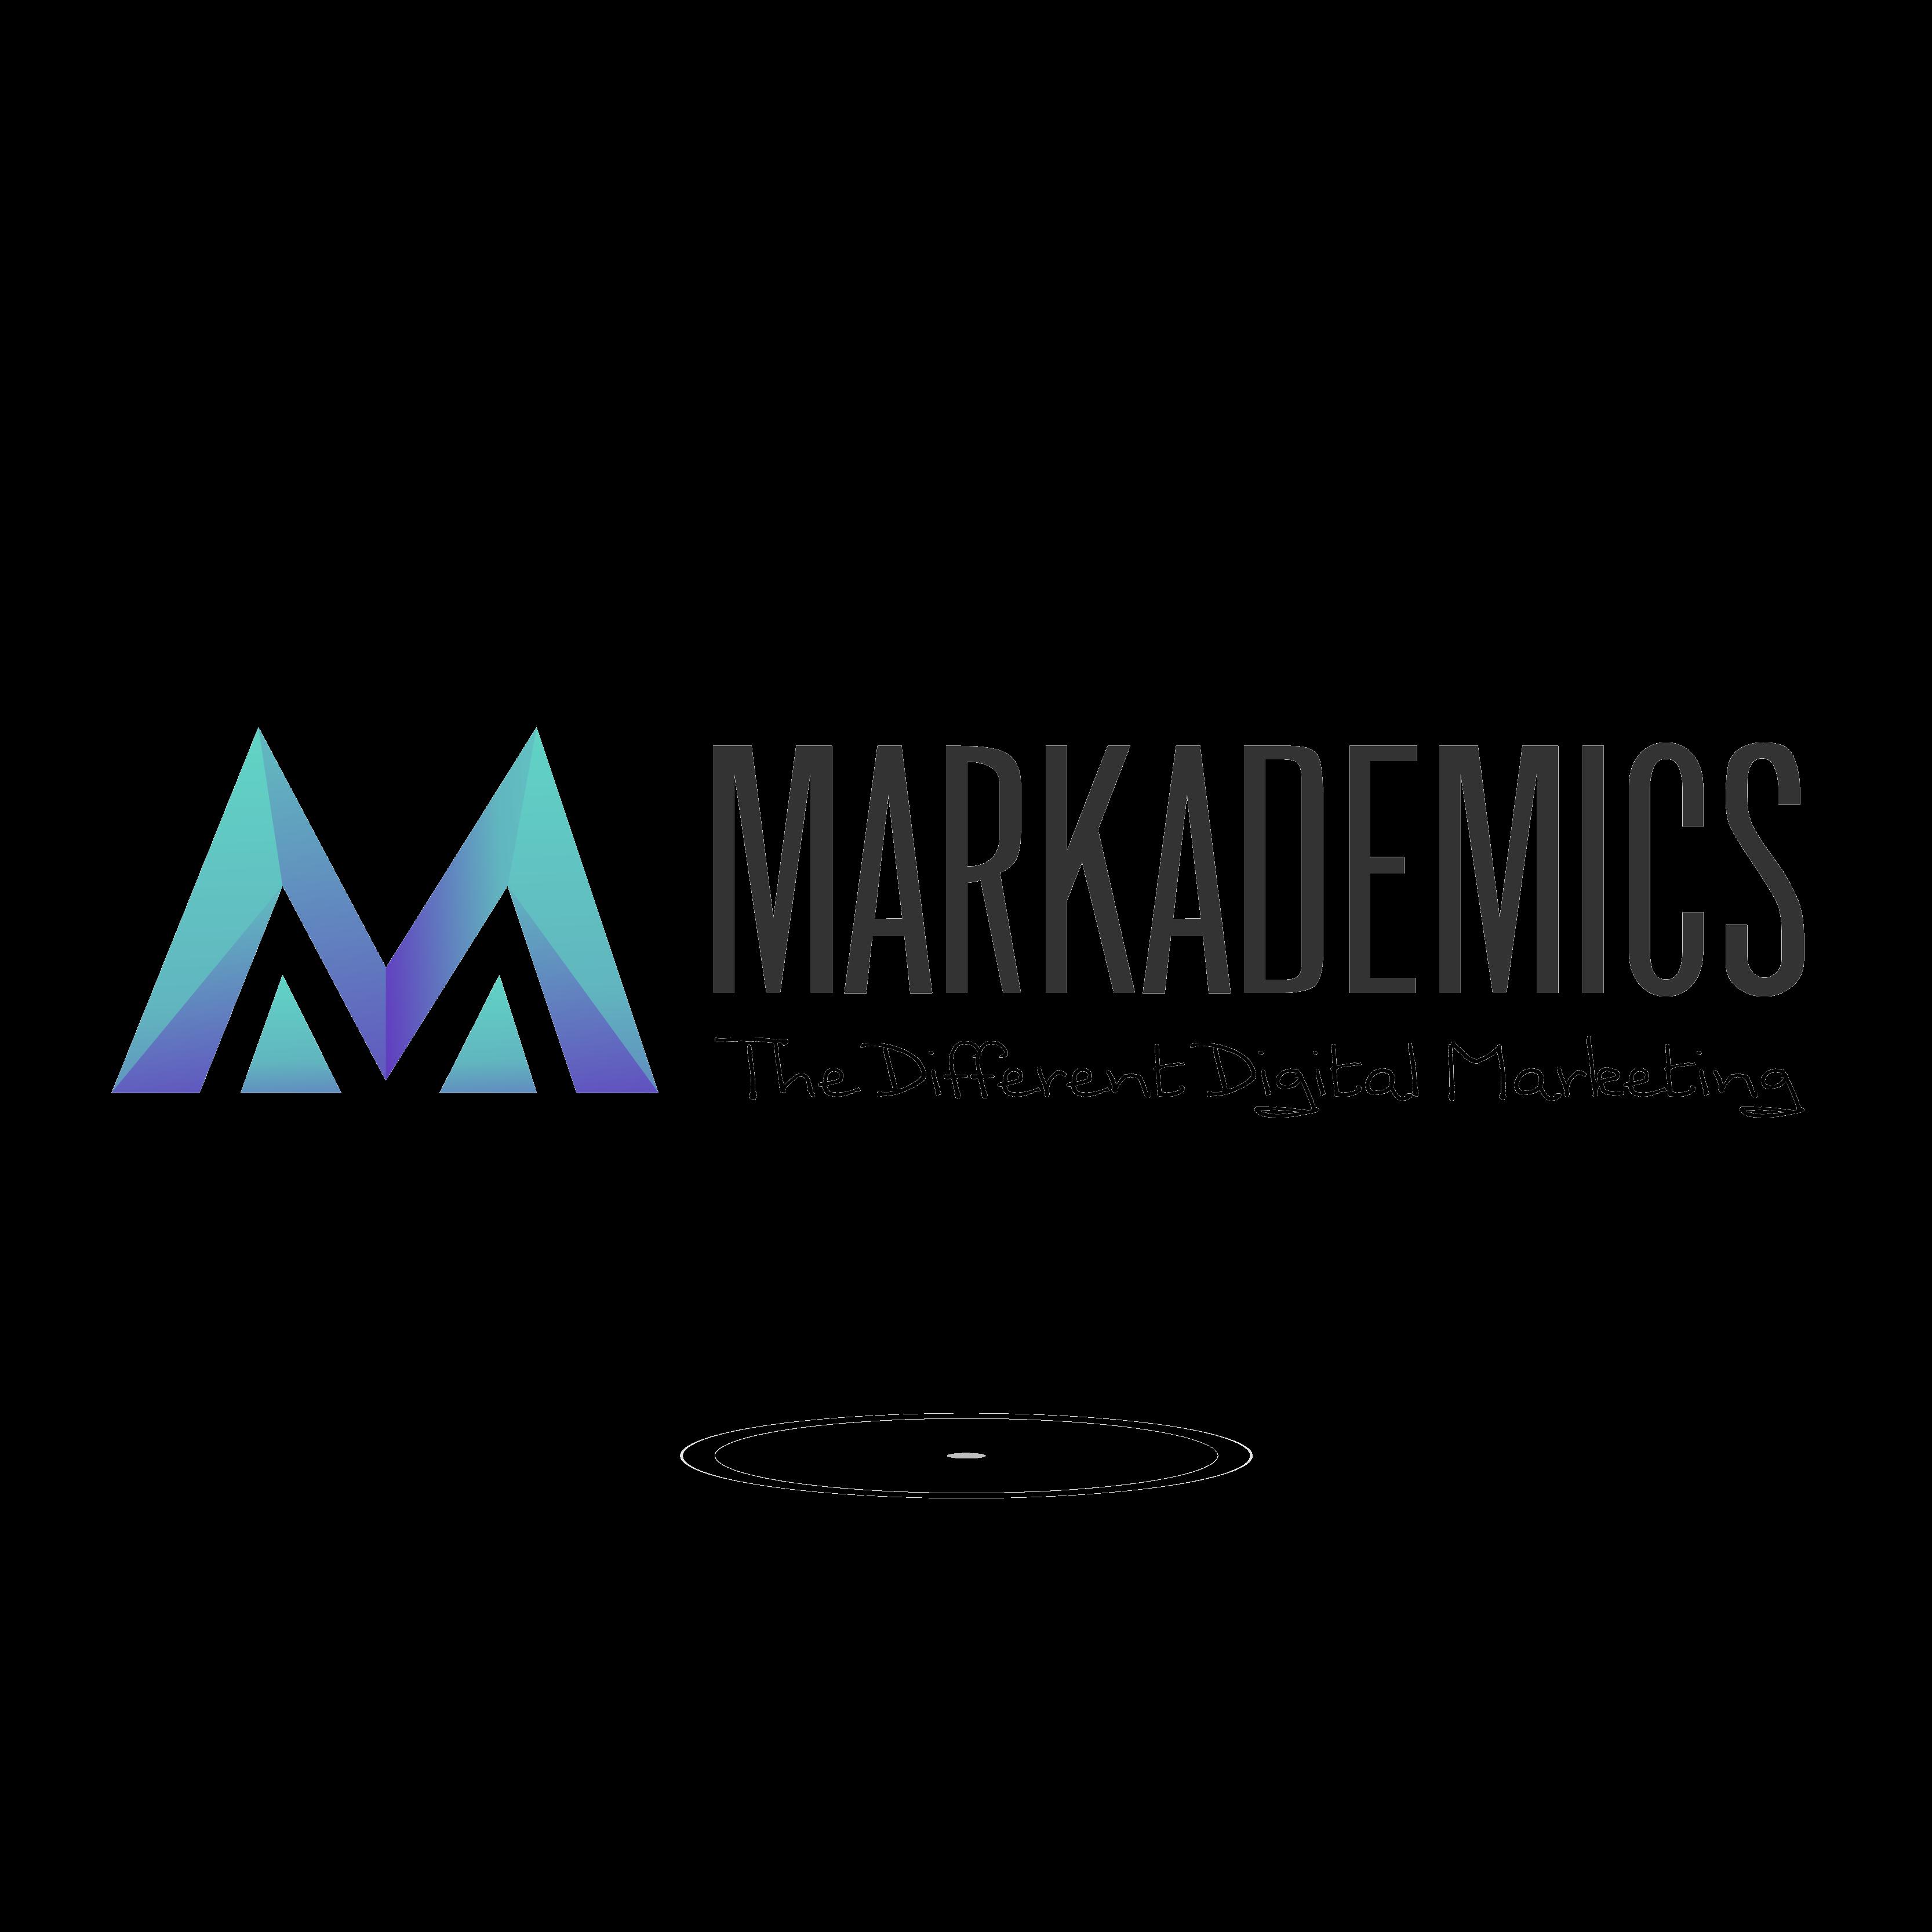 Markademics